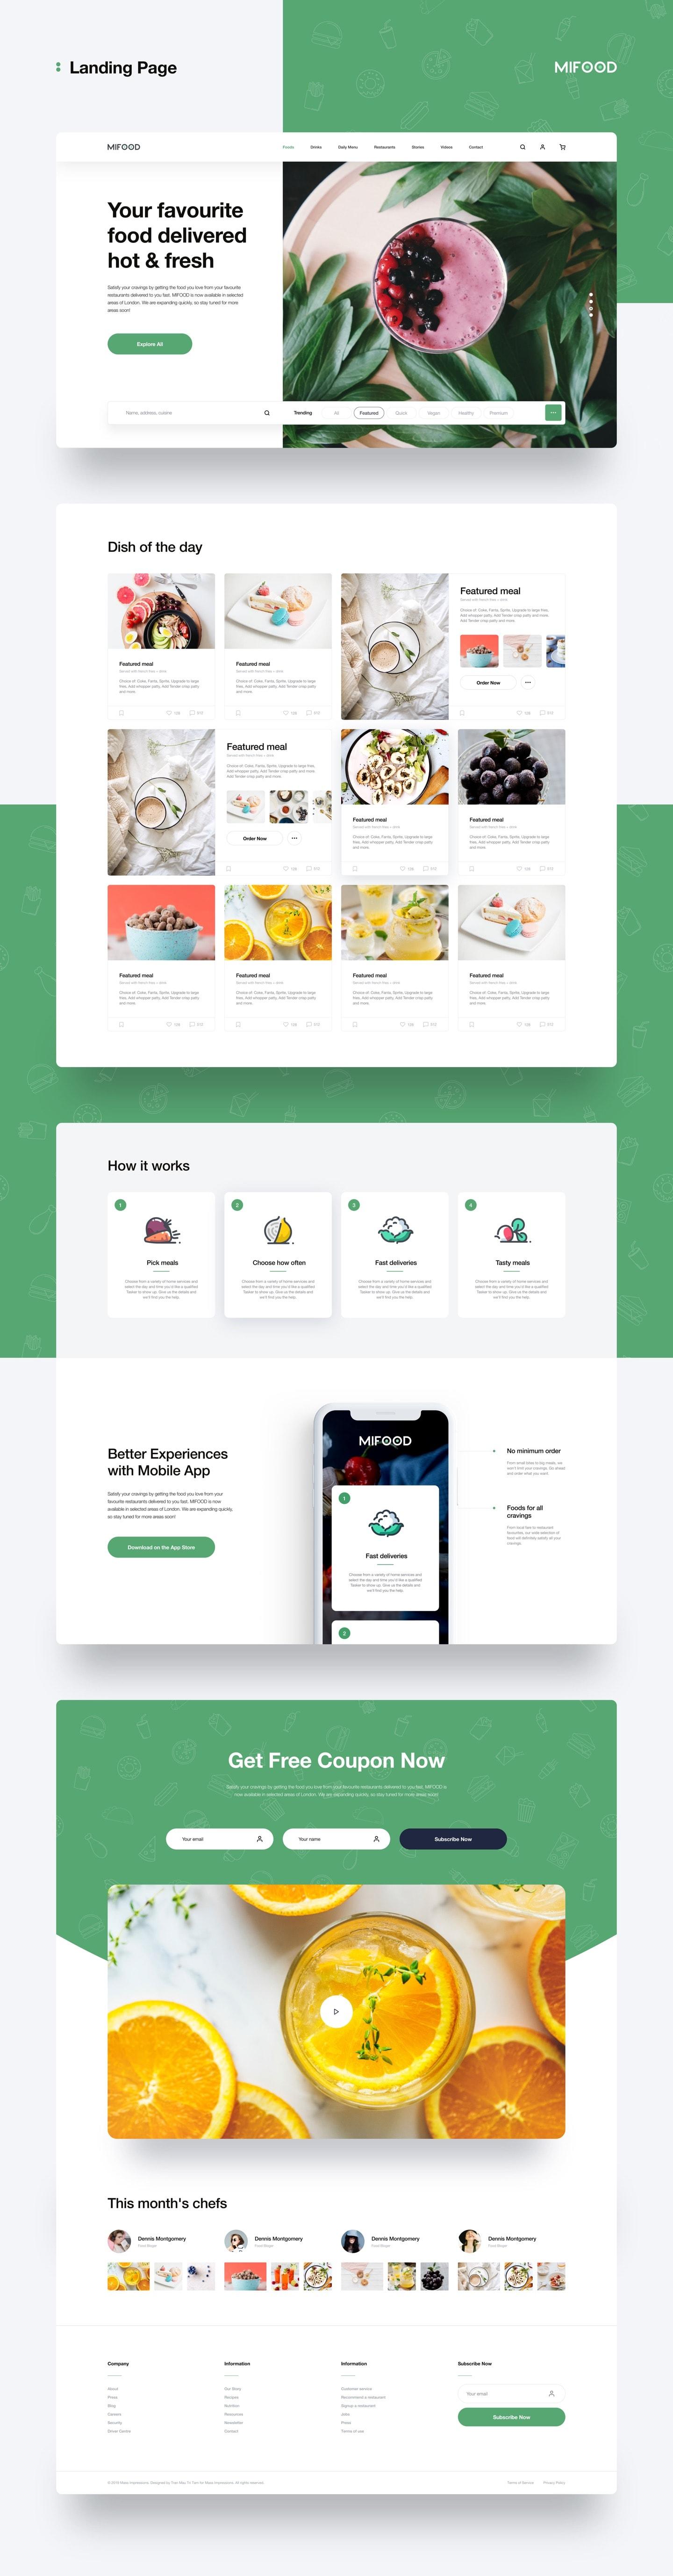 mifoods_freeui.design_02 - landing page